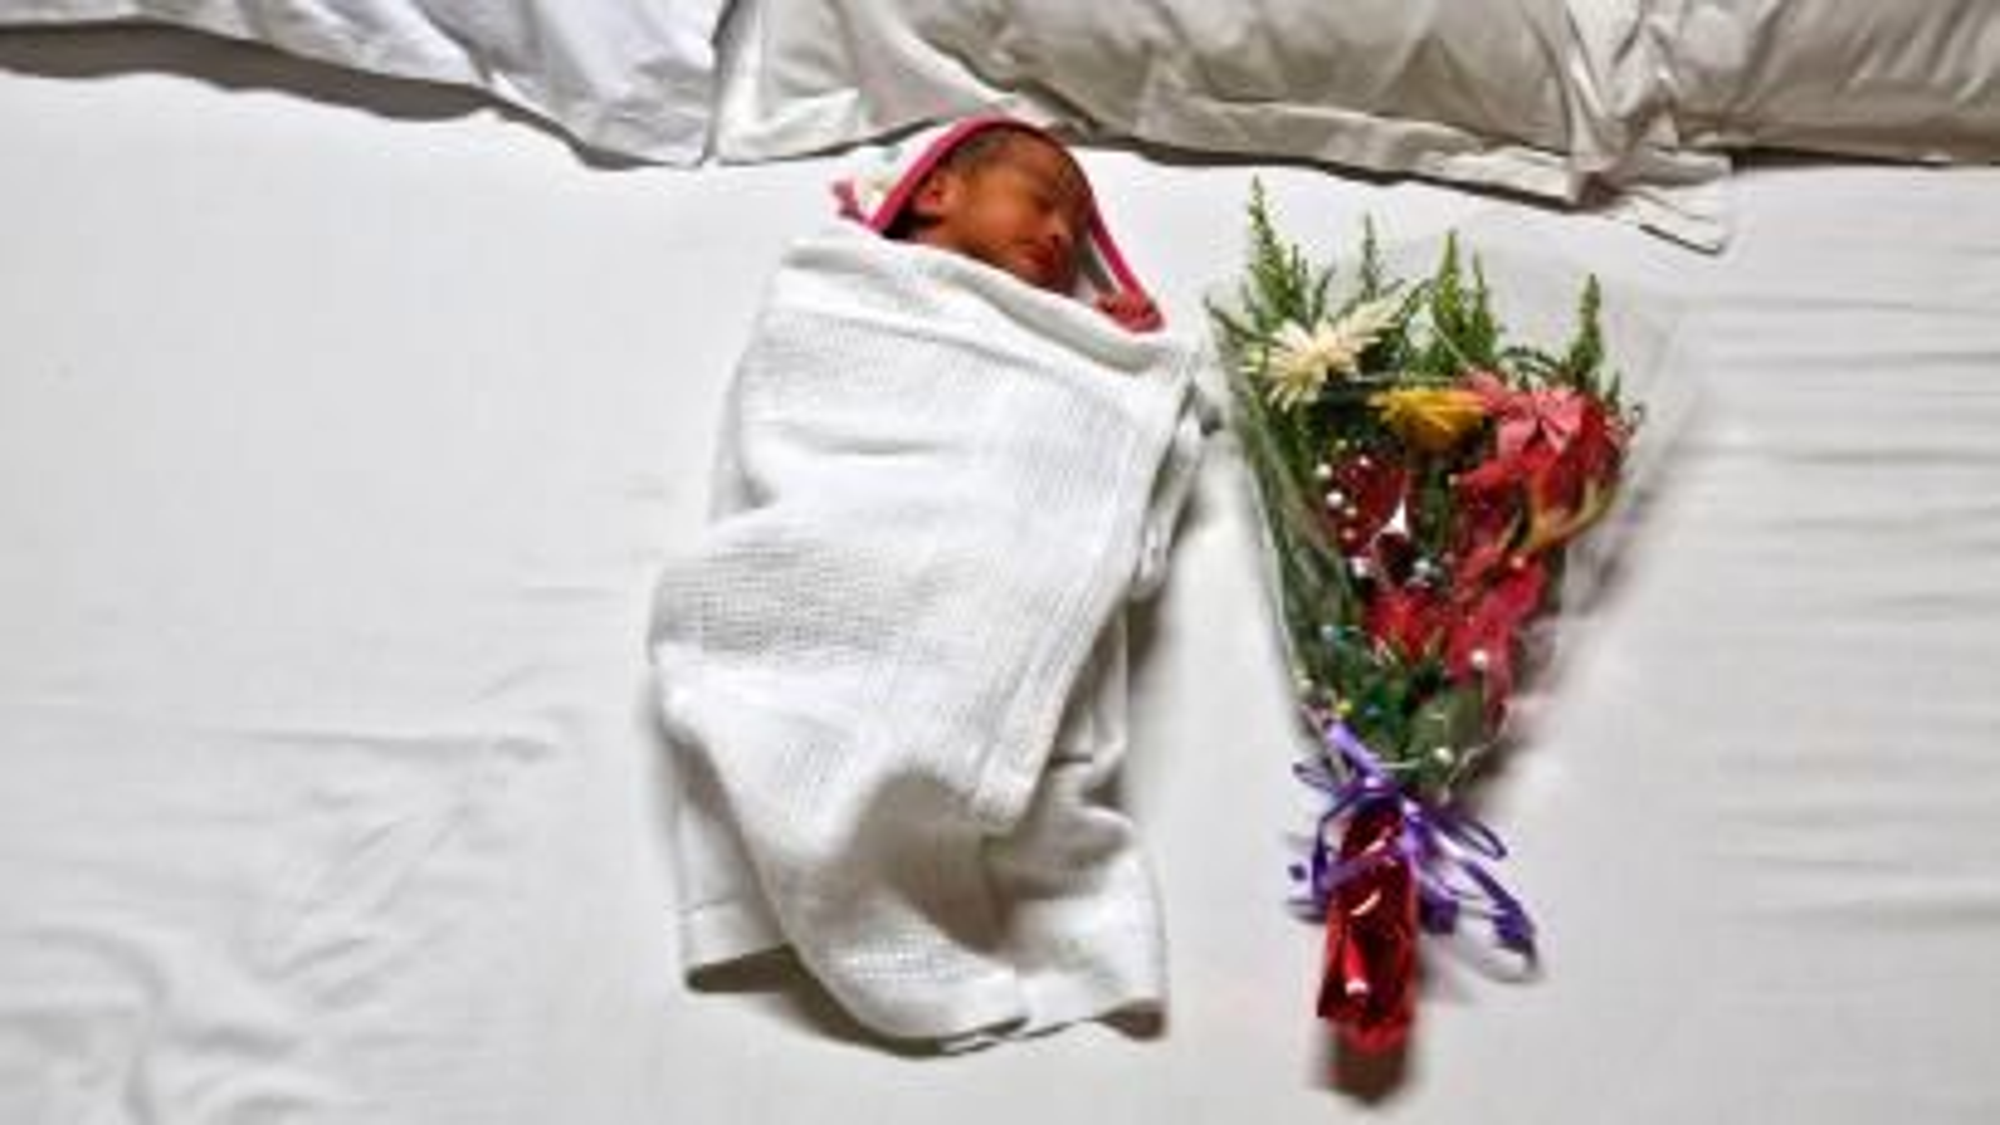 India-Infant-death